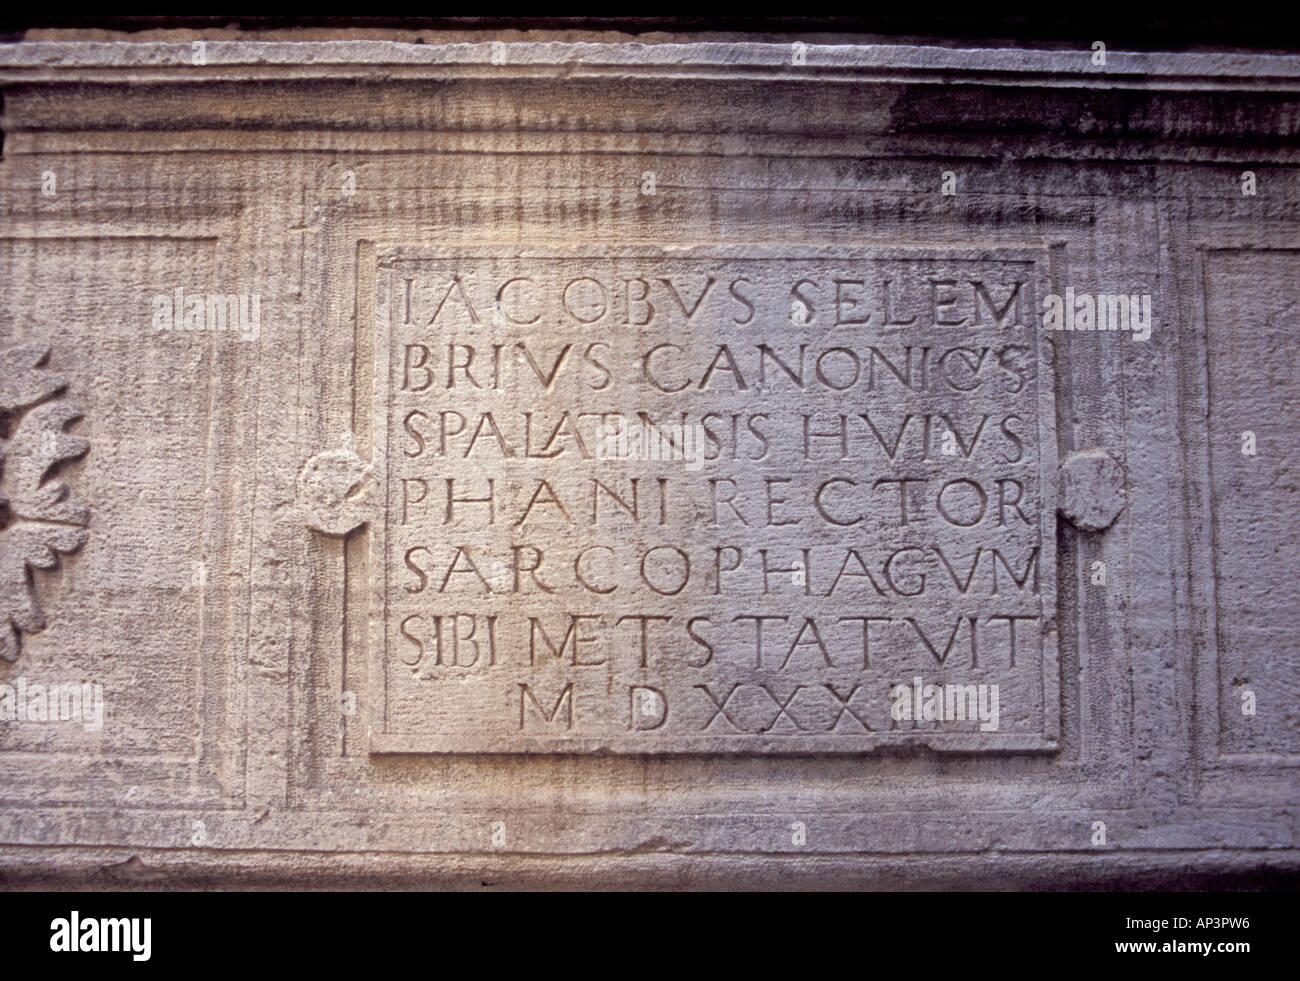 Europe, Croatia, Dalmatia, Split, Diocletian's Palace. Roman inscription in the Temple of Jupiter - Stock Image